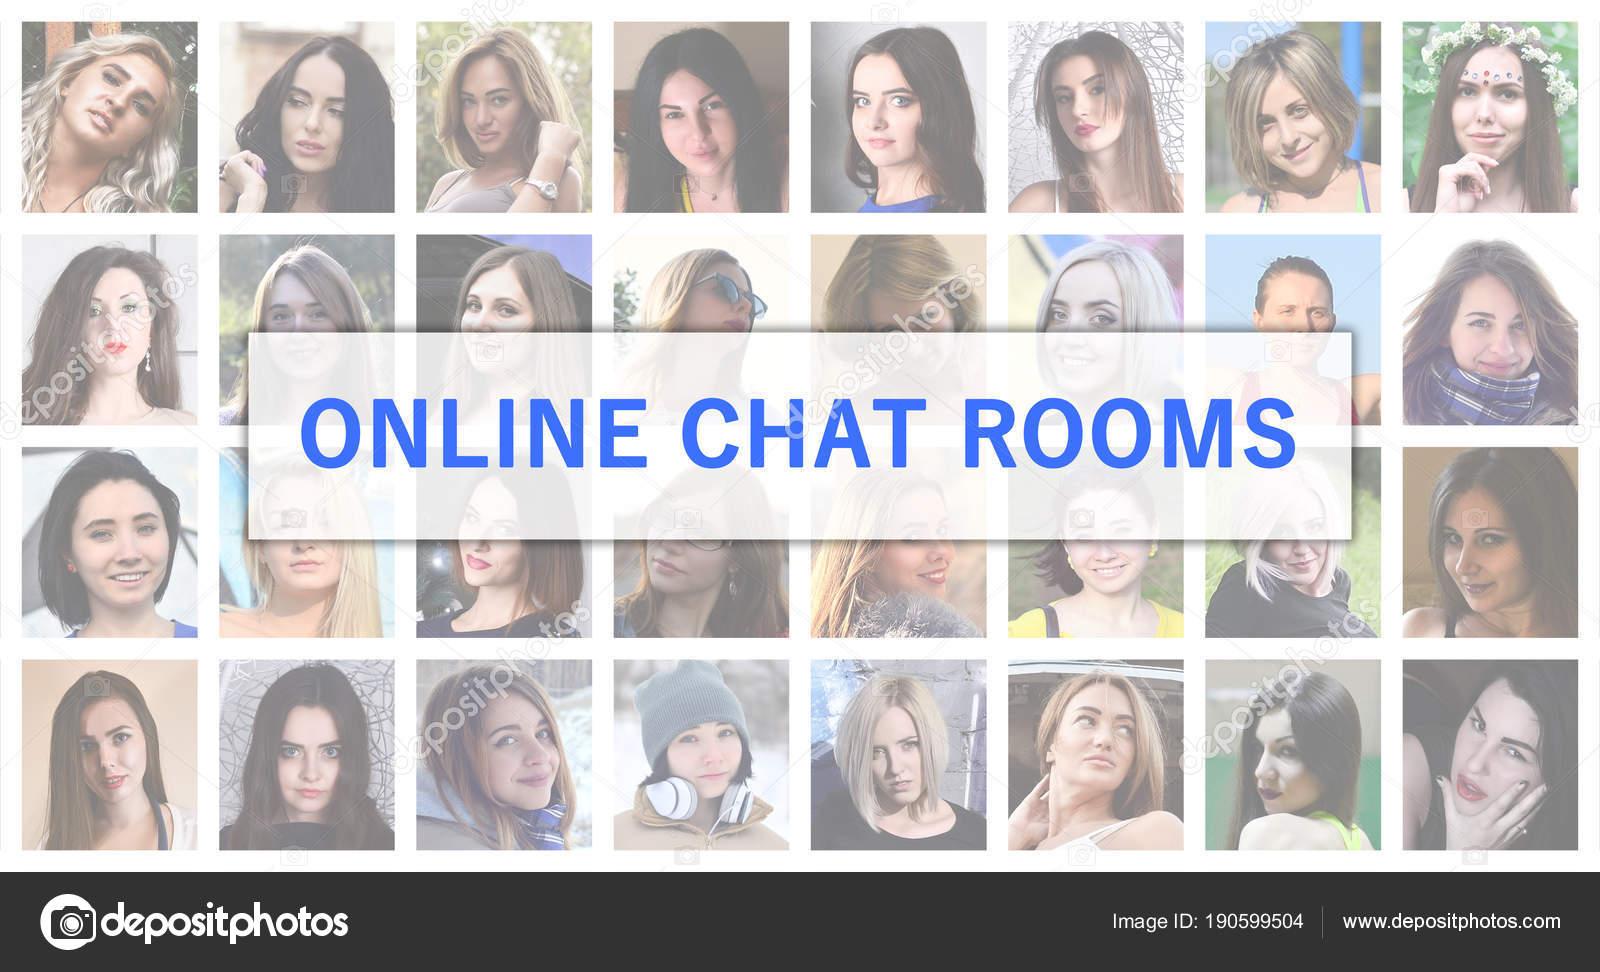 online chat δωμάτια που χρονολογούνται κεφάλαιο 12 Γεωλογικός χρόνος σημείο 12,3 χρονολογήσεις με απαντήσεις ραδιενέργειας